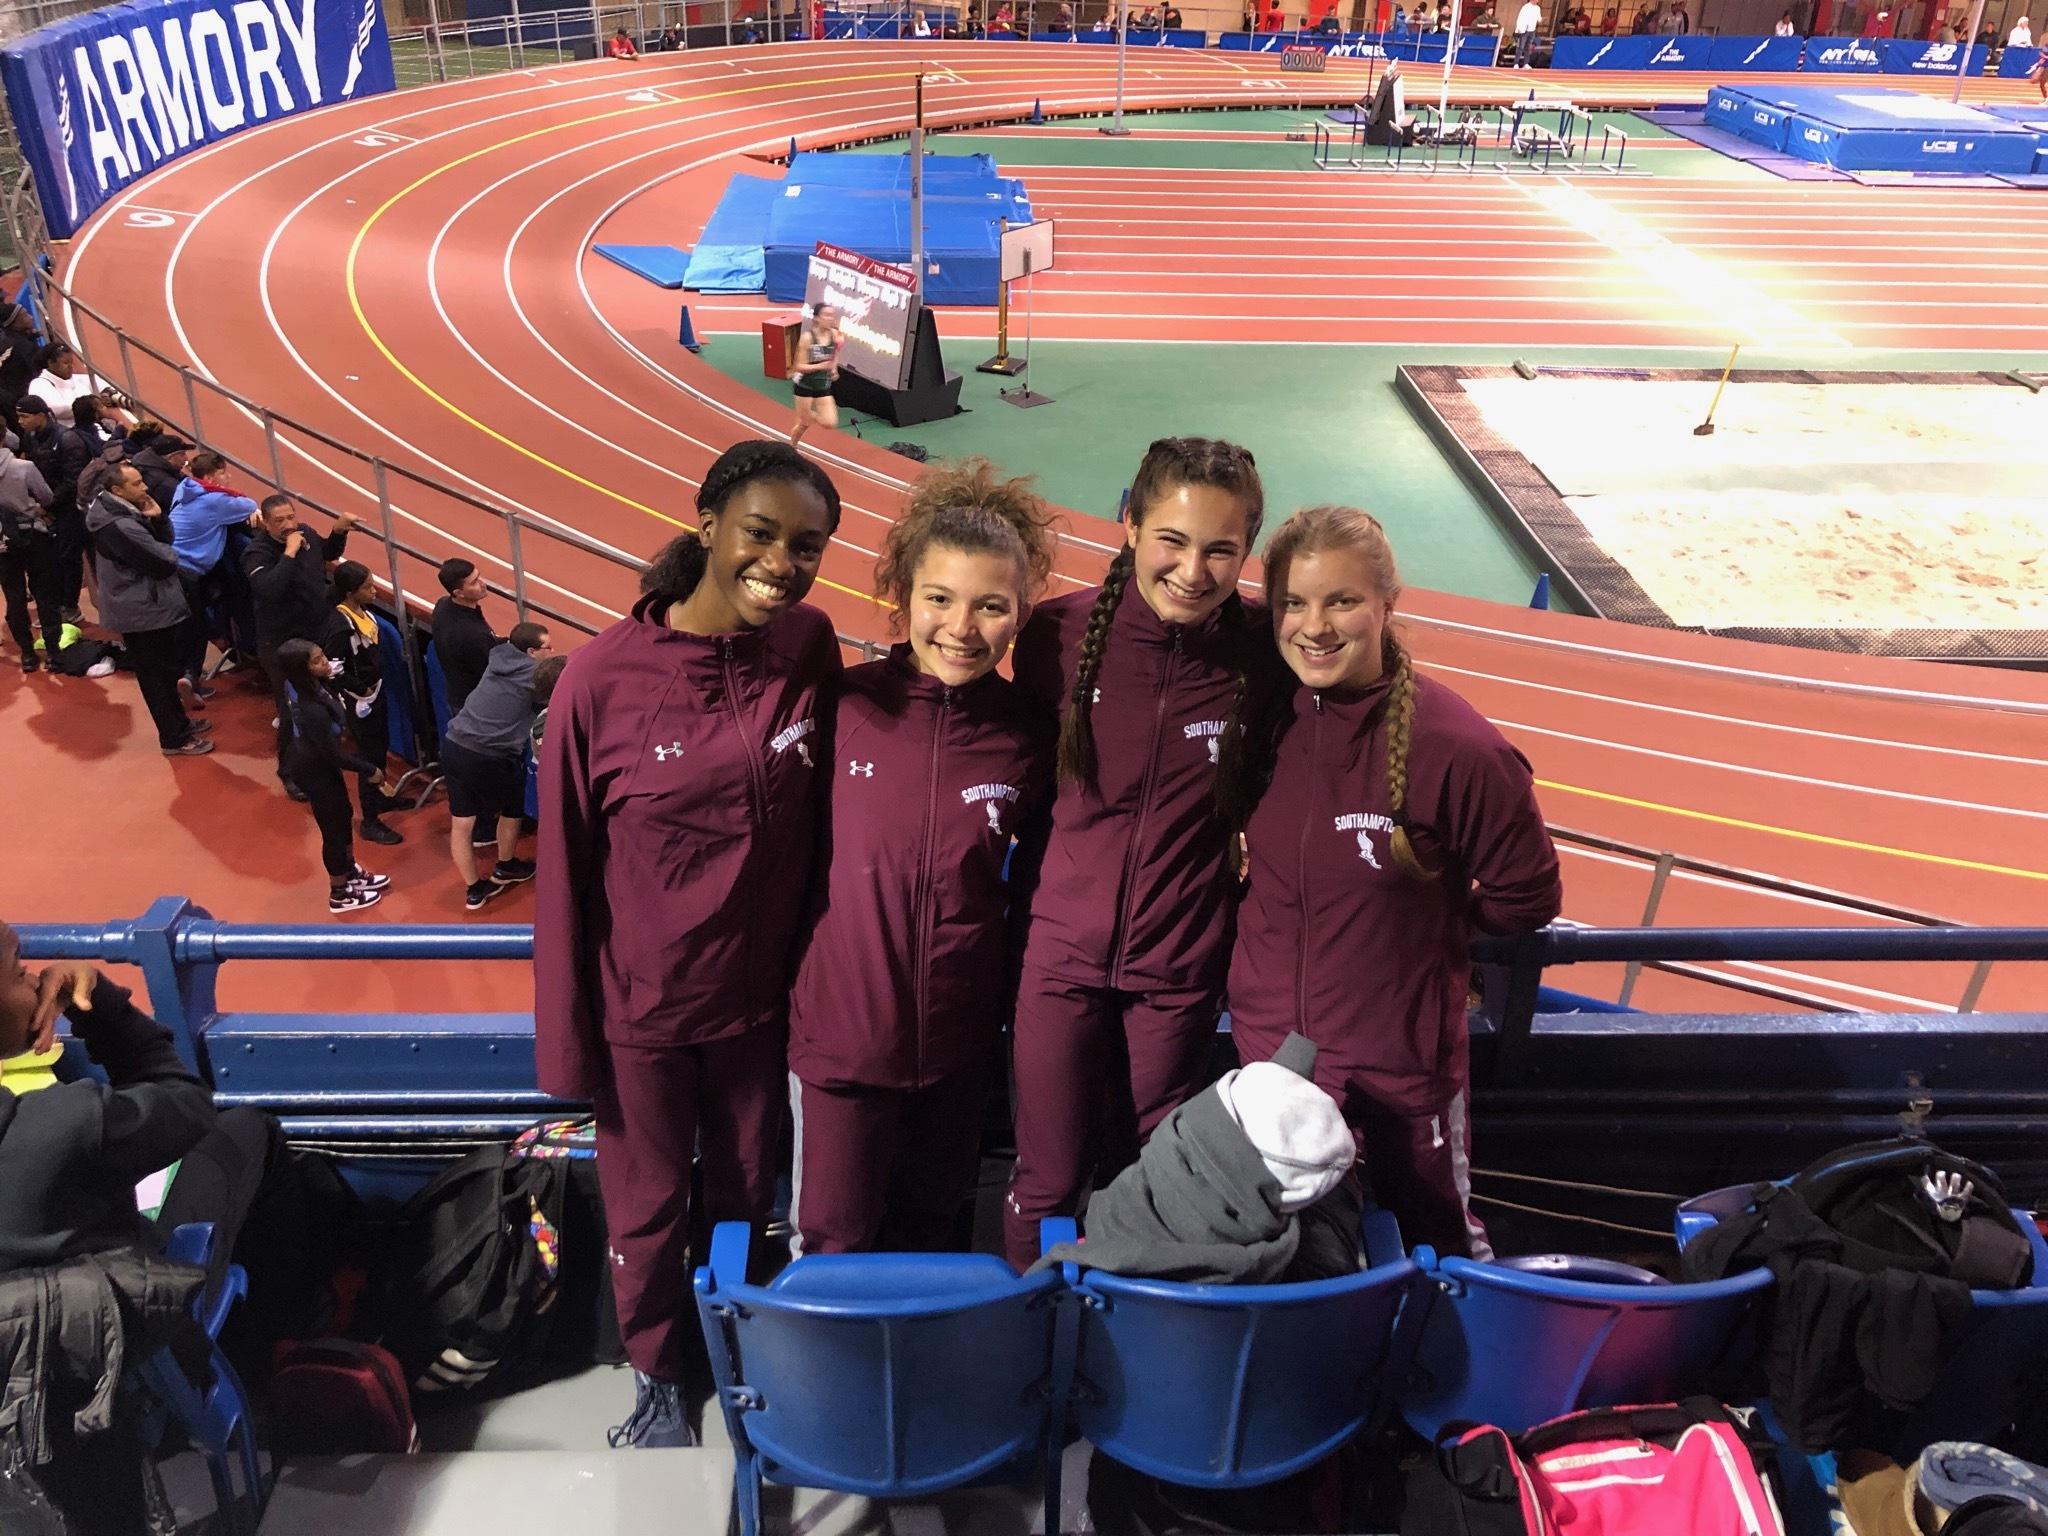 Southampton 4x400-meter relay team of Dreanne Joseph, Gabriella Arnold, Amanda Mannino and Rebekah Morirtz set a new school record at the Millrose Games last week.